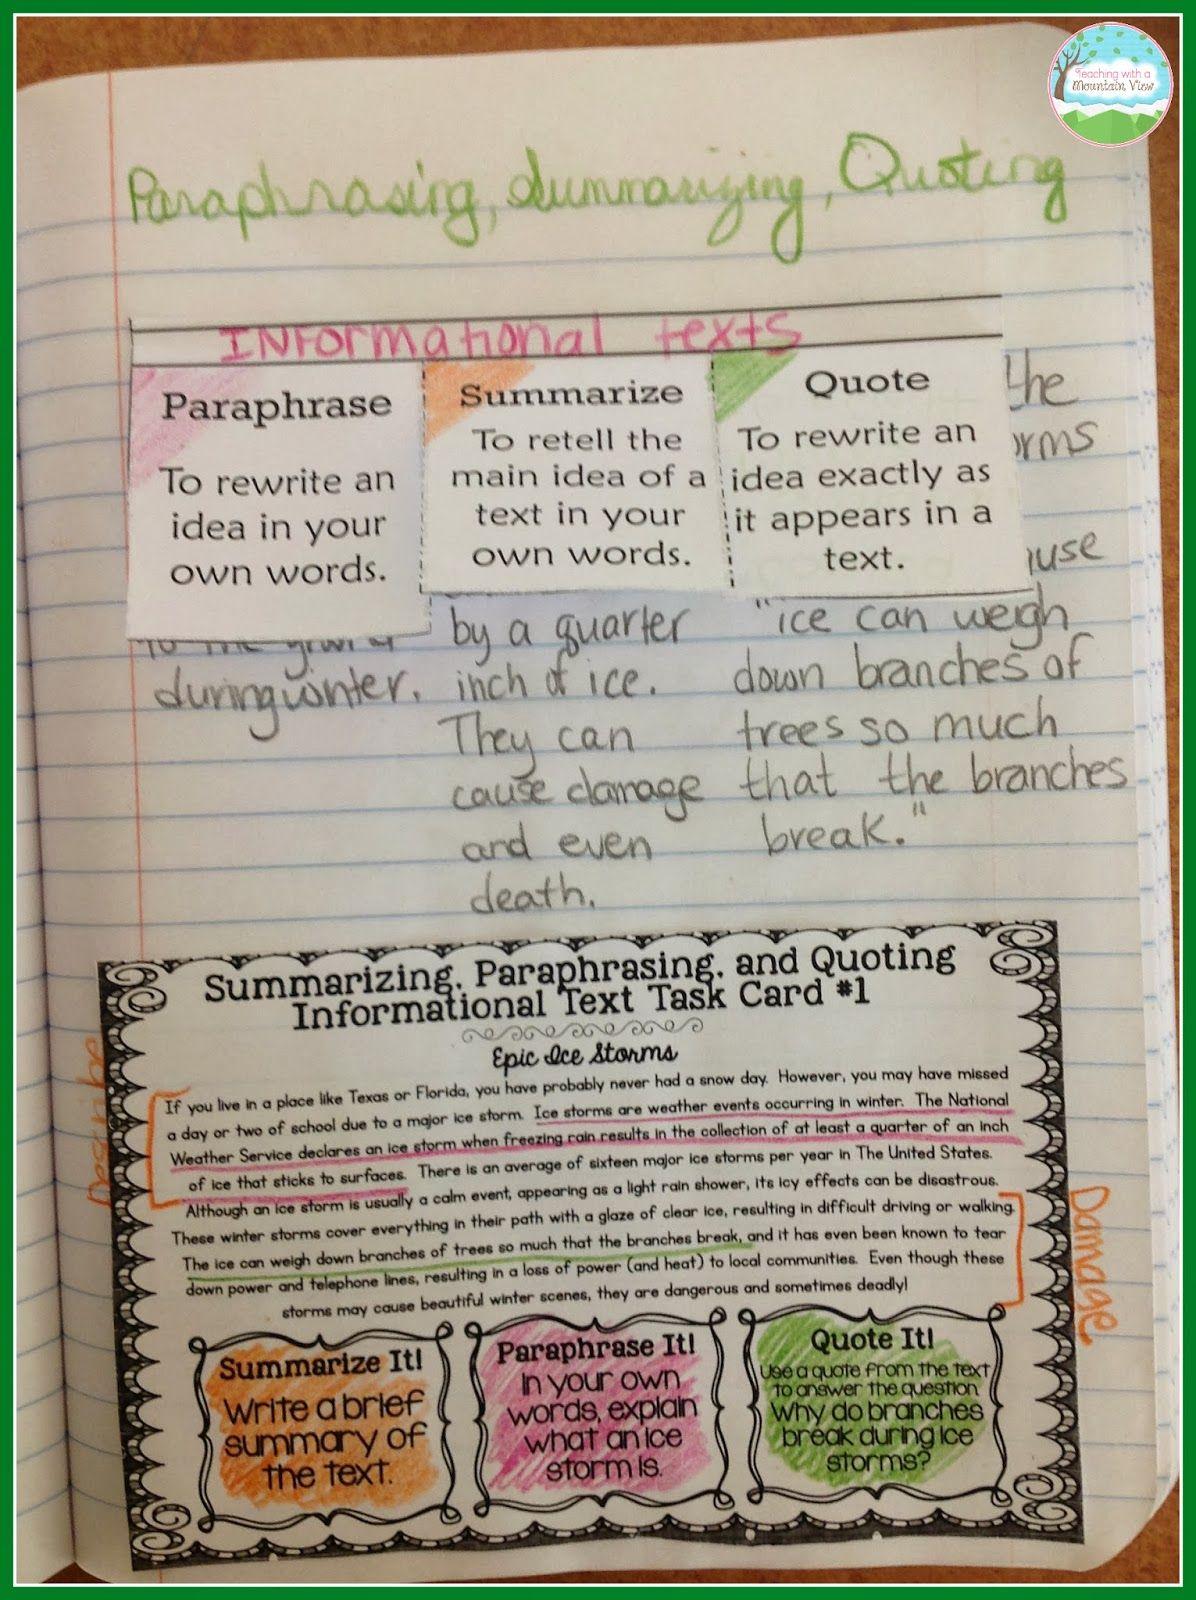 Summarizing Paraphrasing And Quoting Texts